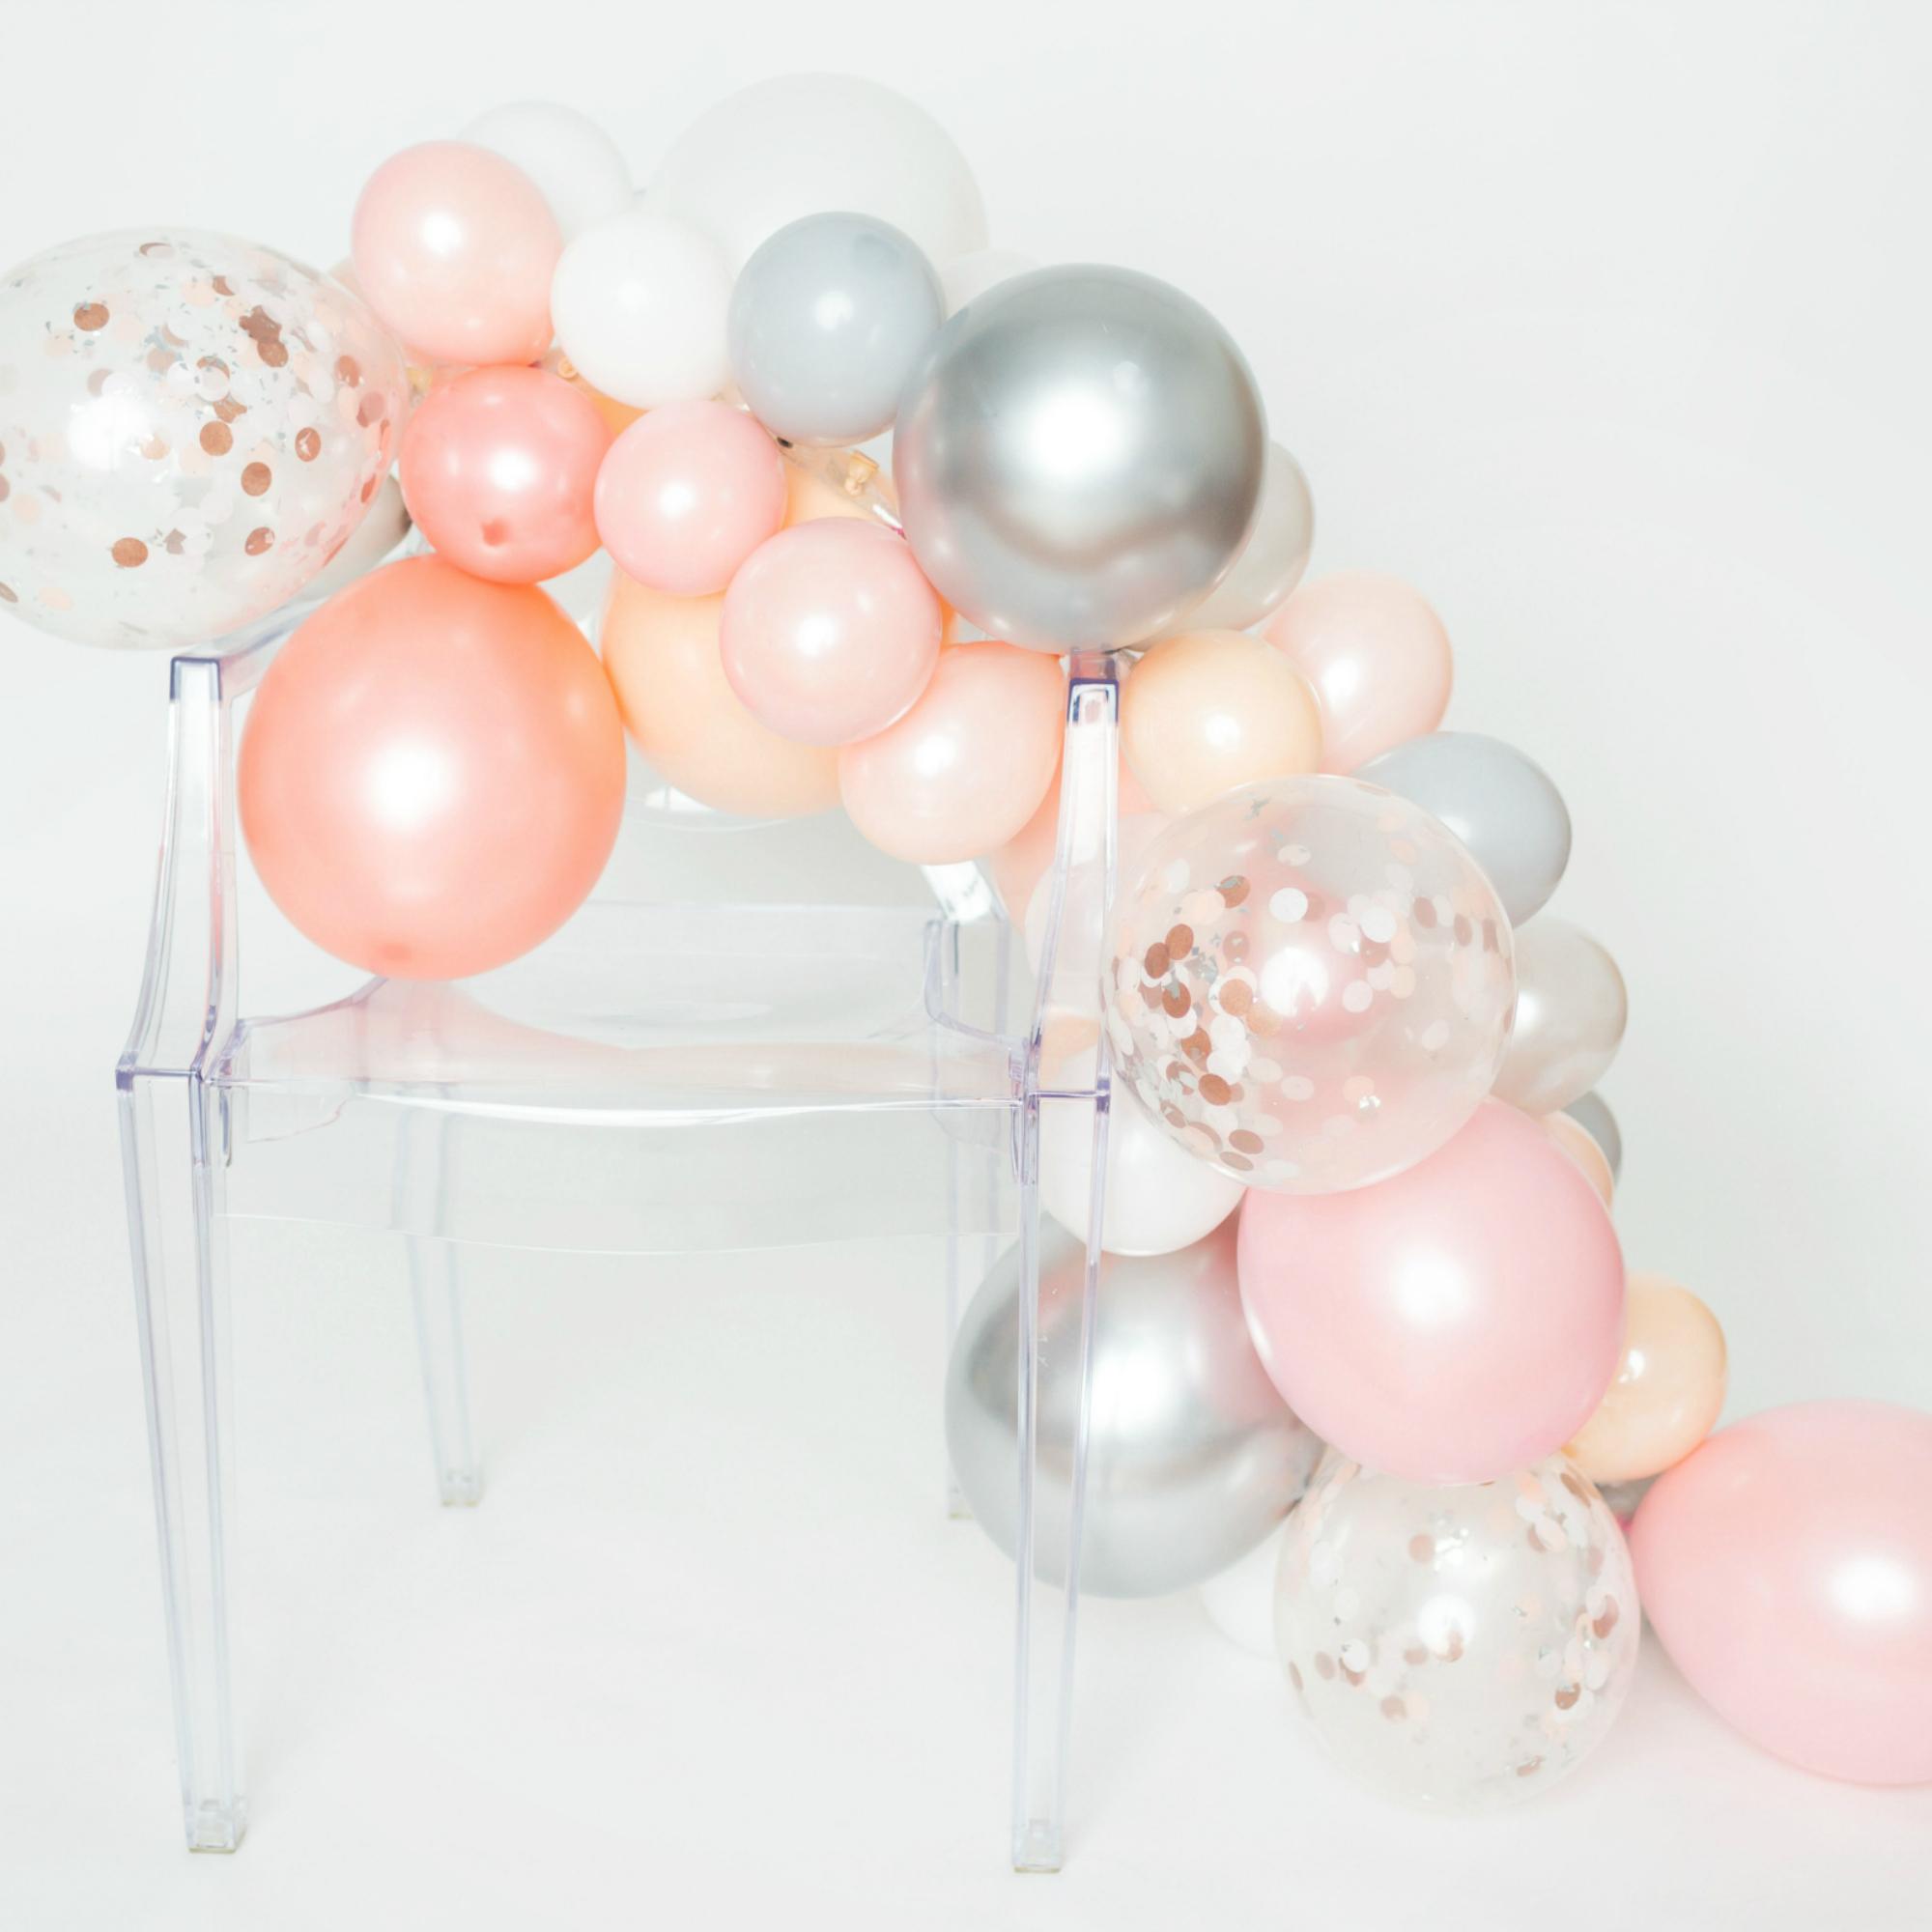 Diy Balloon Garland Kit Prosecco